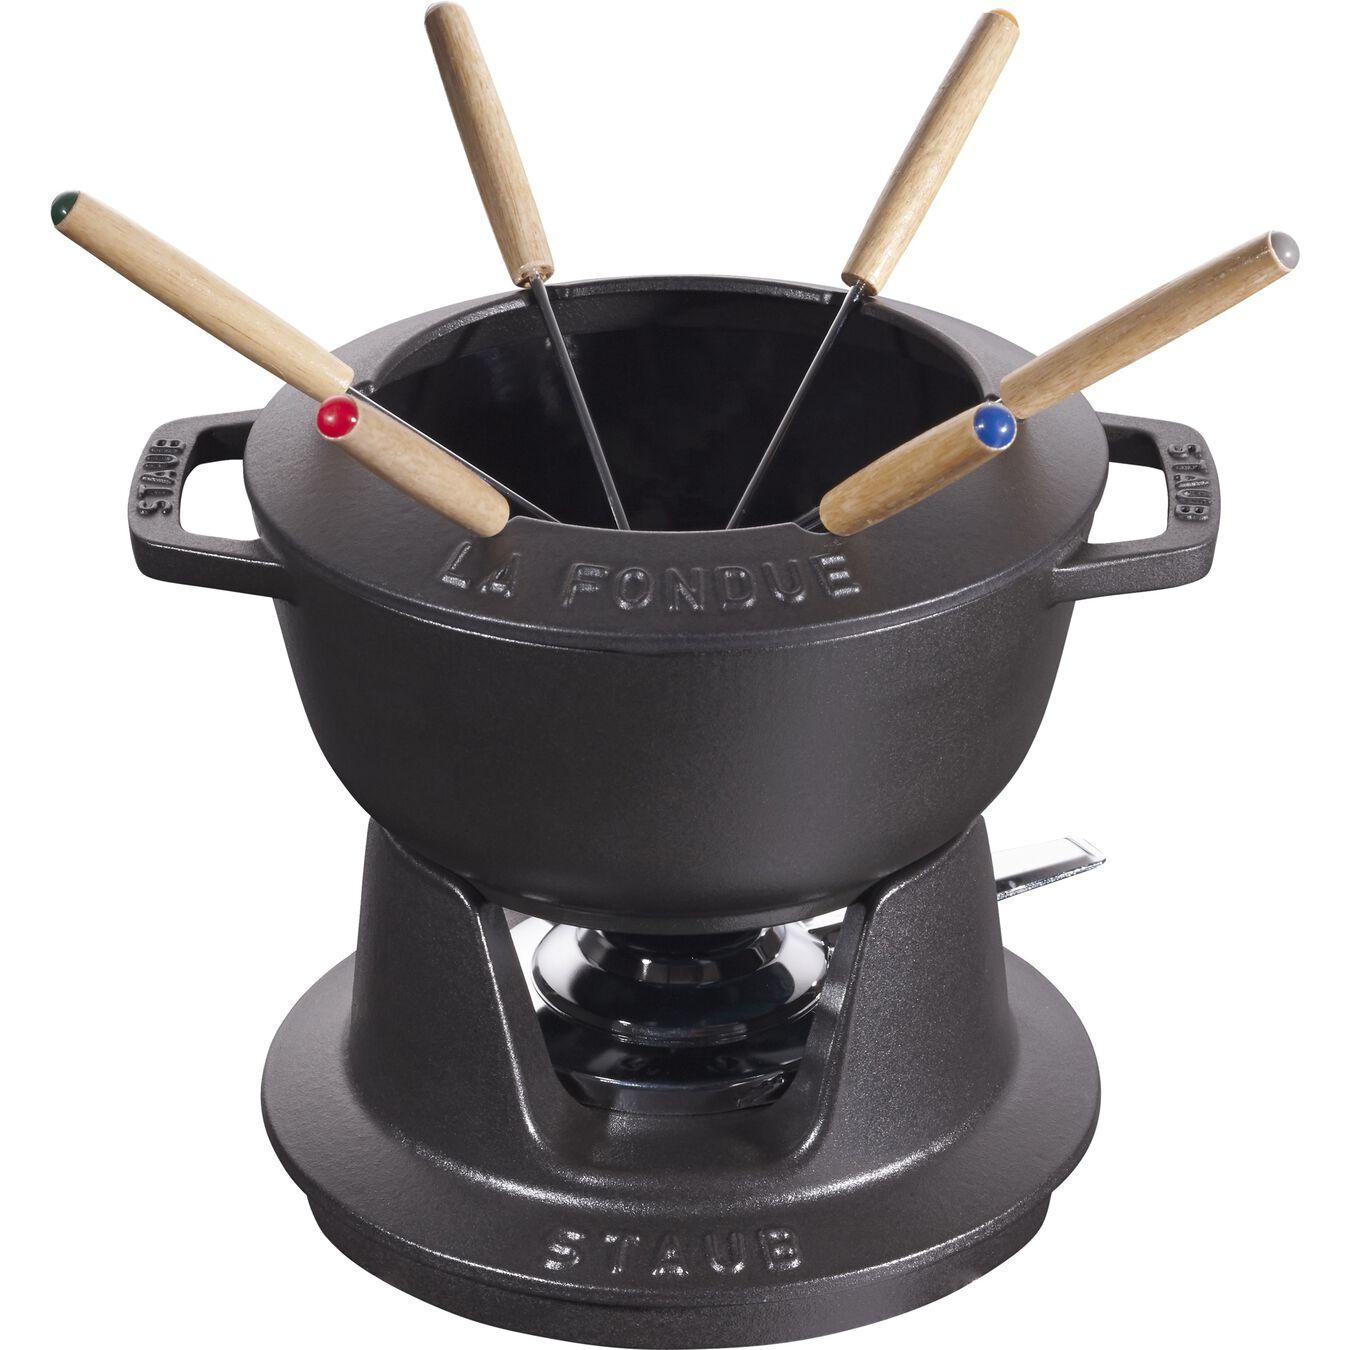 Conjunto para fondue 18 cm, Preto,,large 1